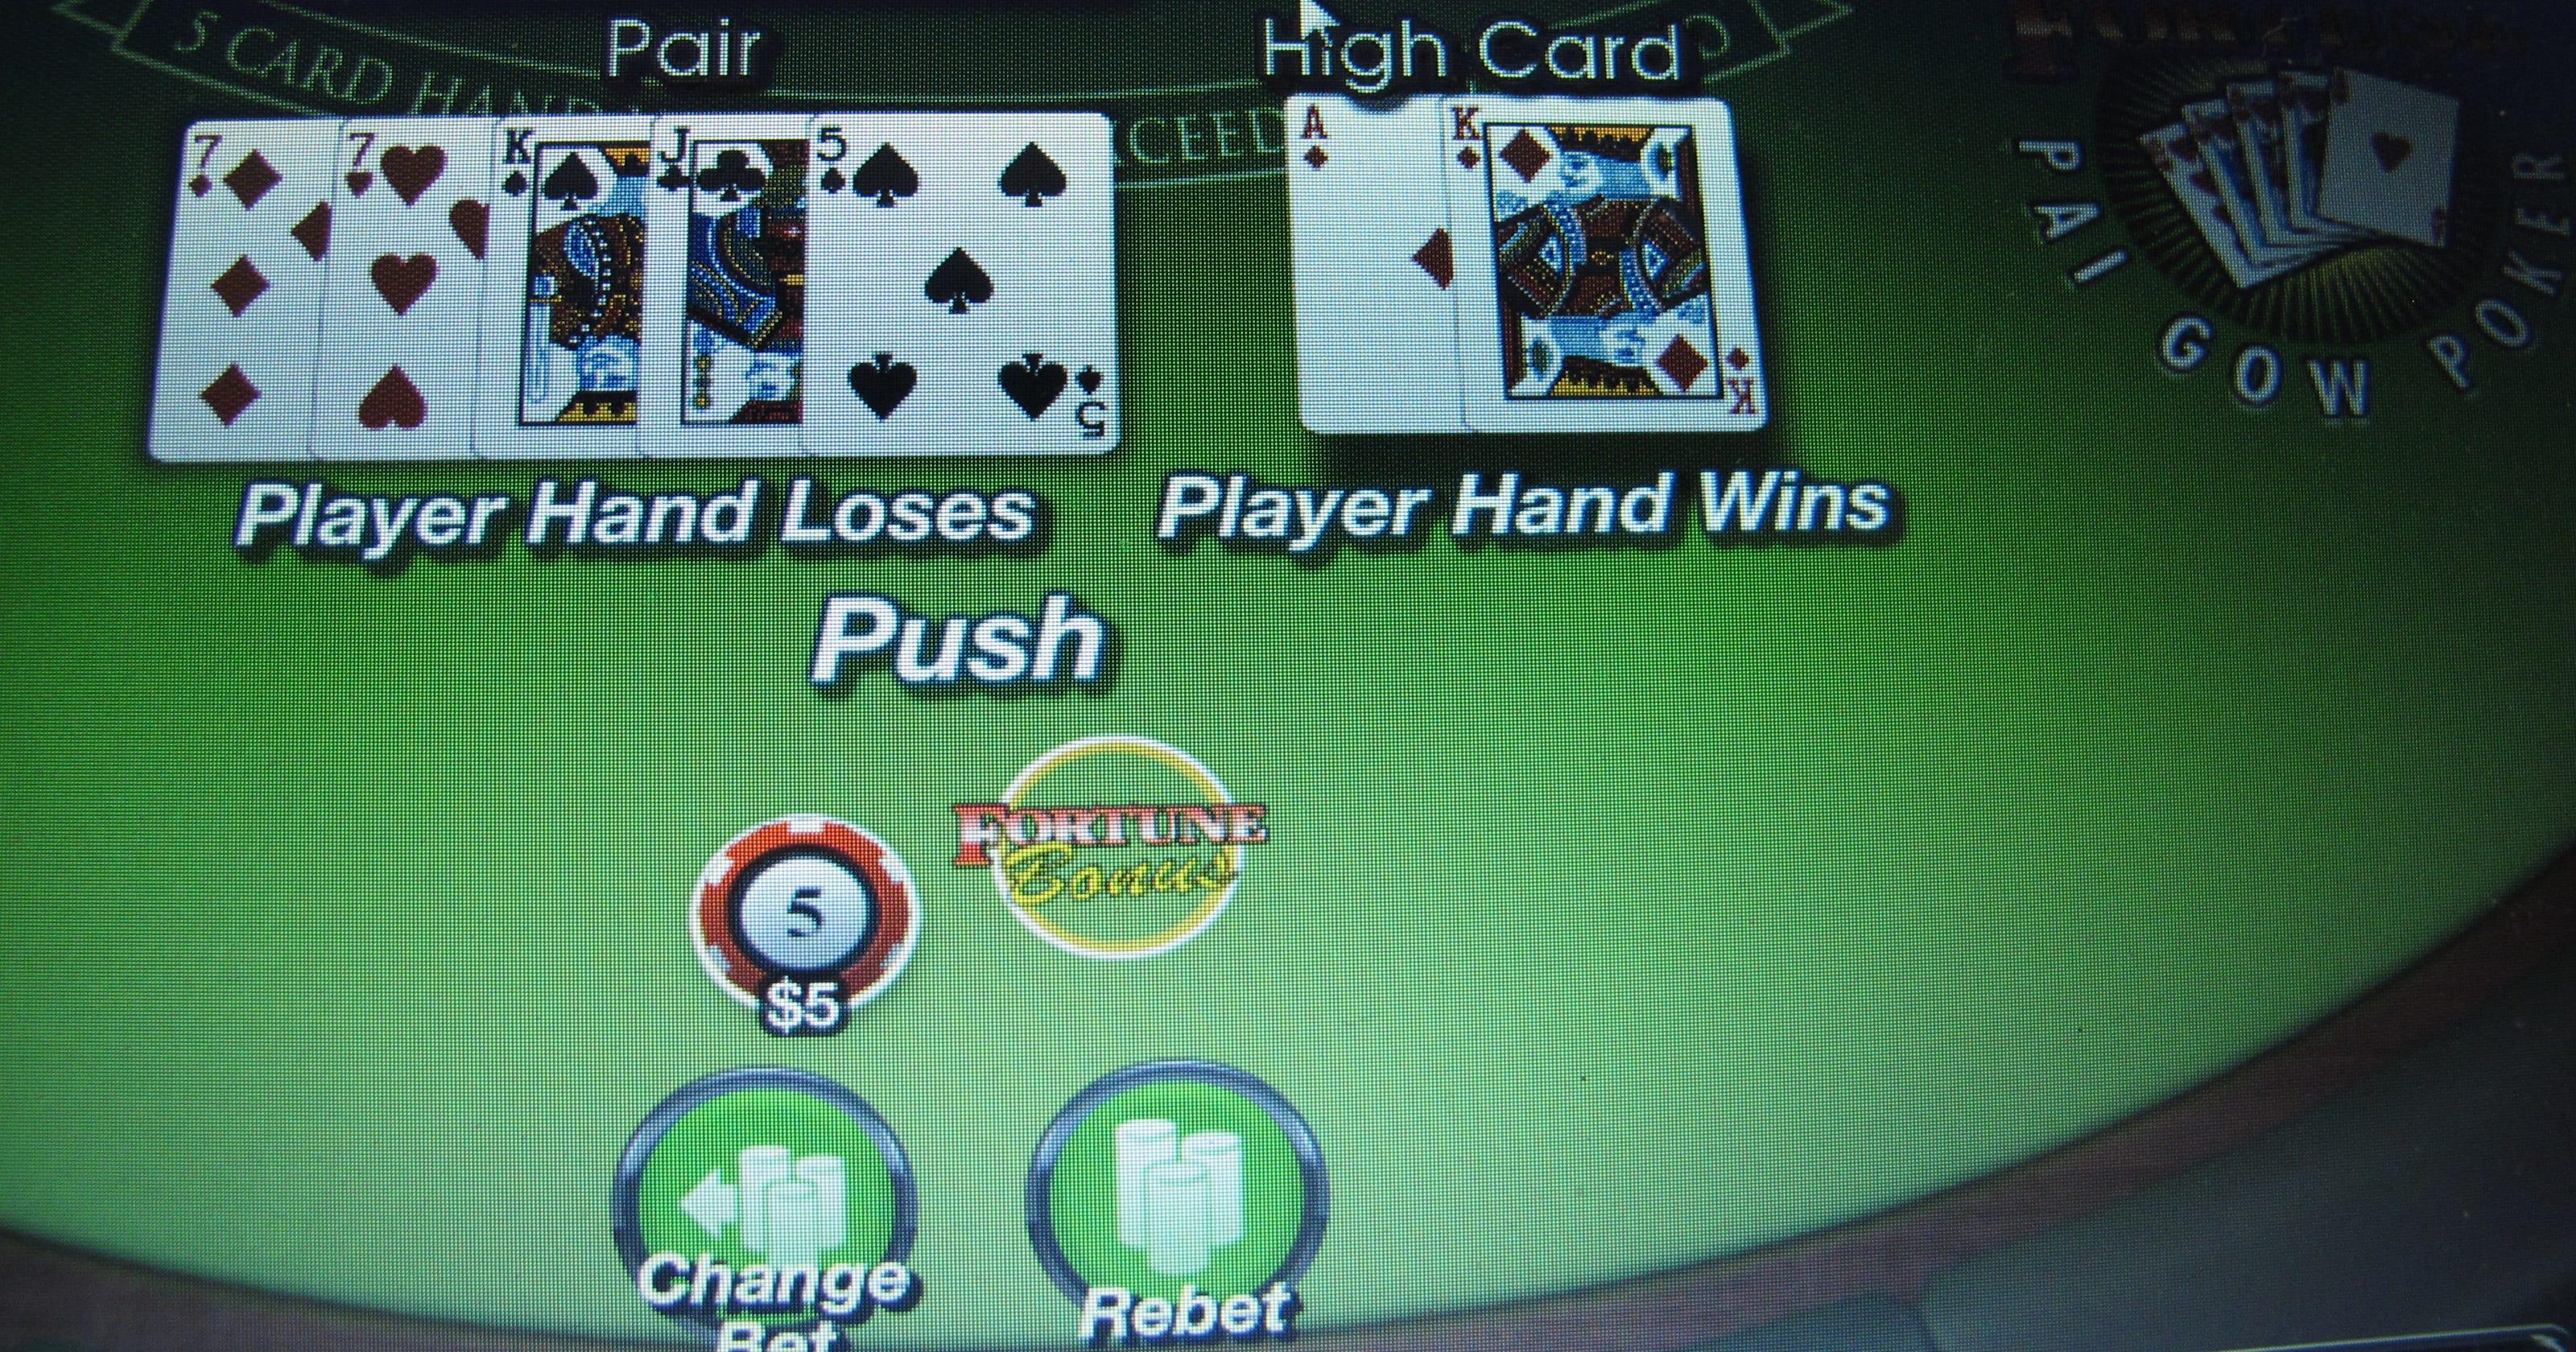 Online gambling spurs addiction fears